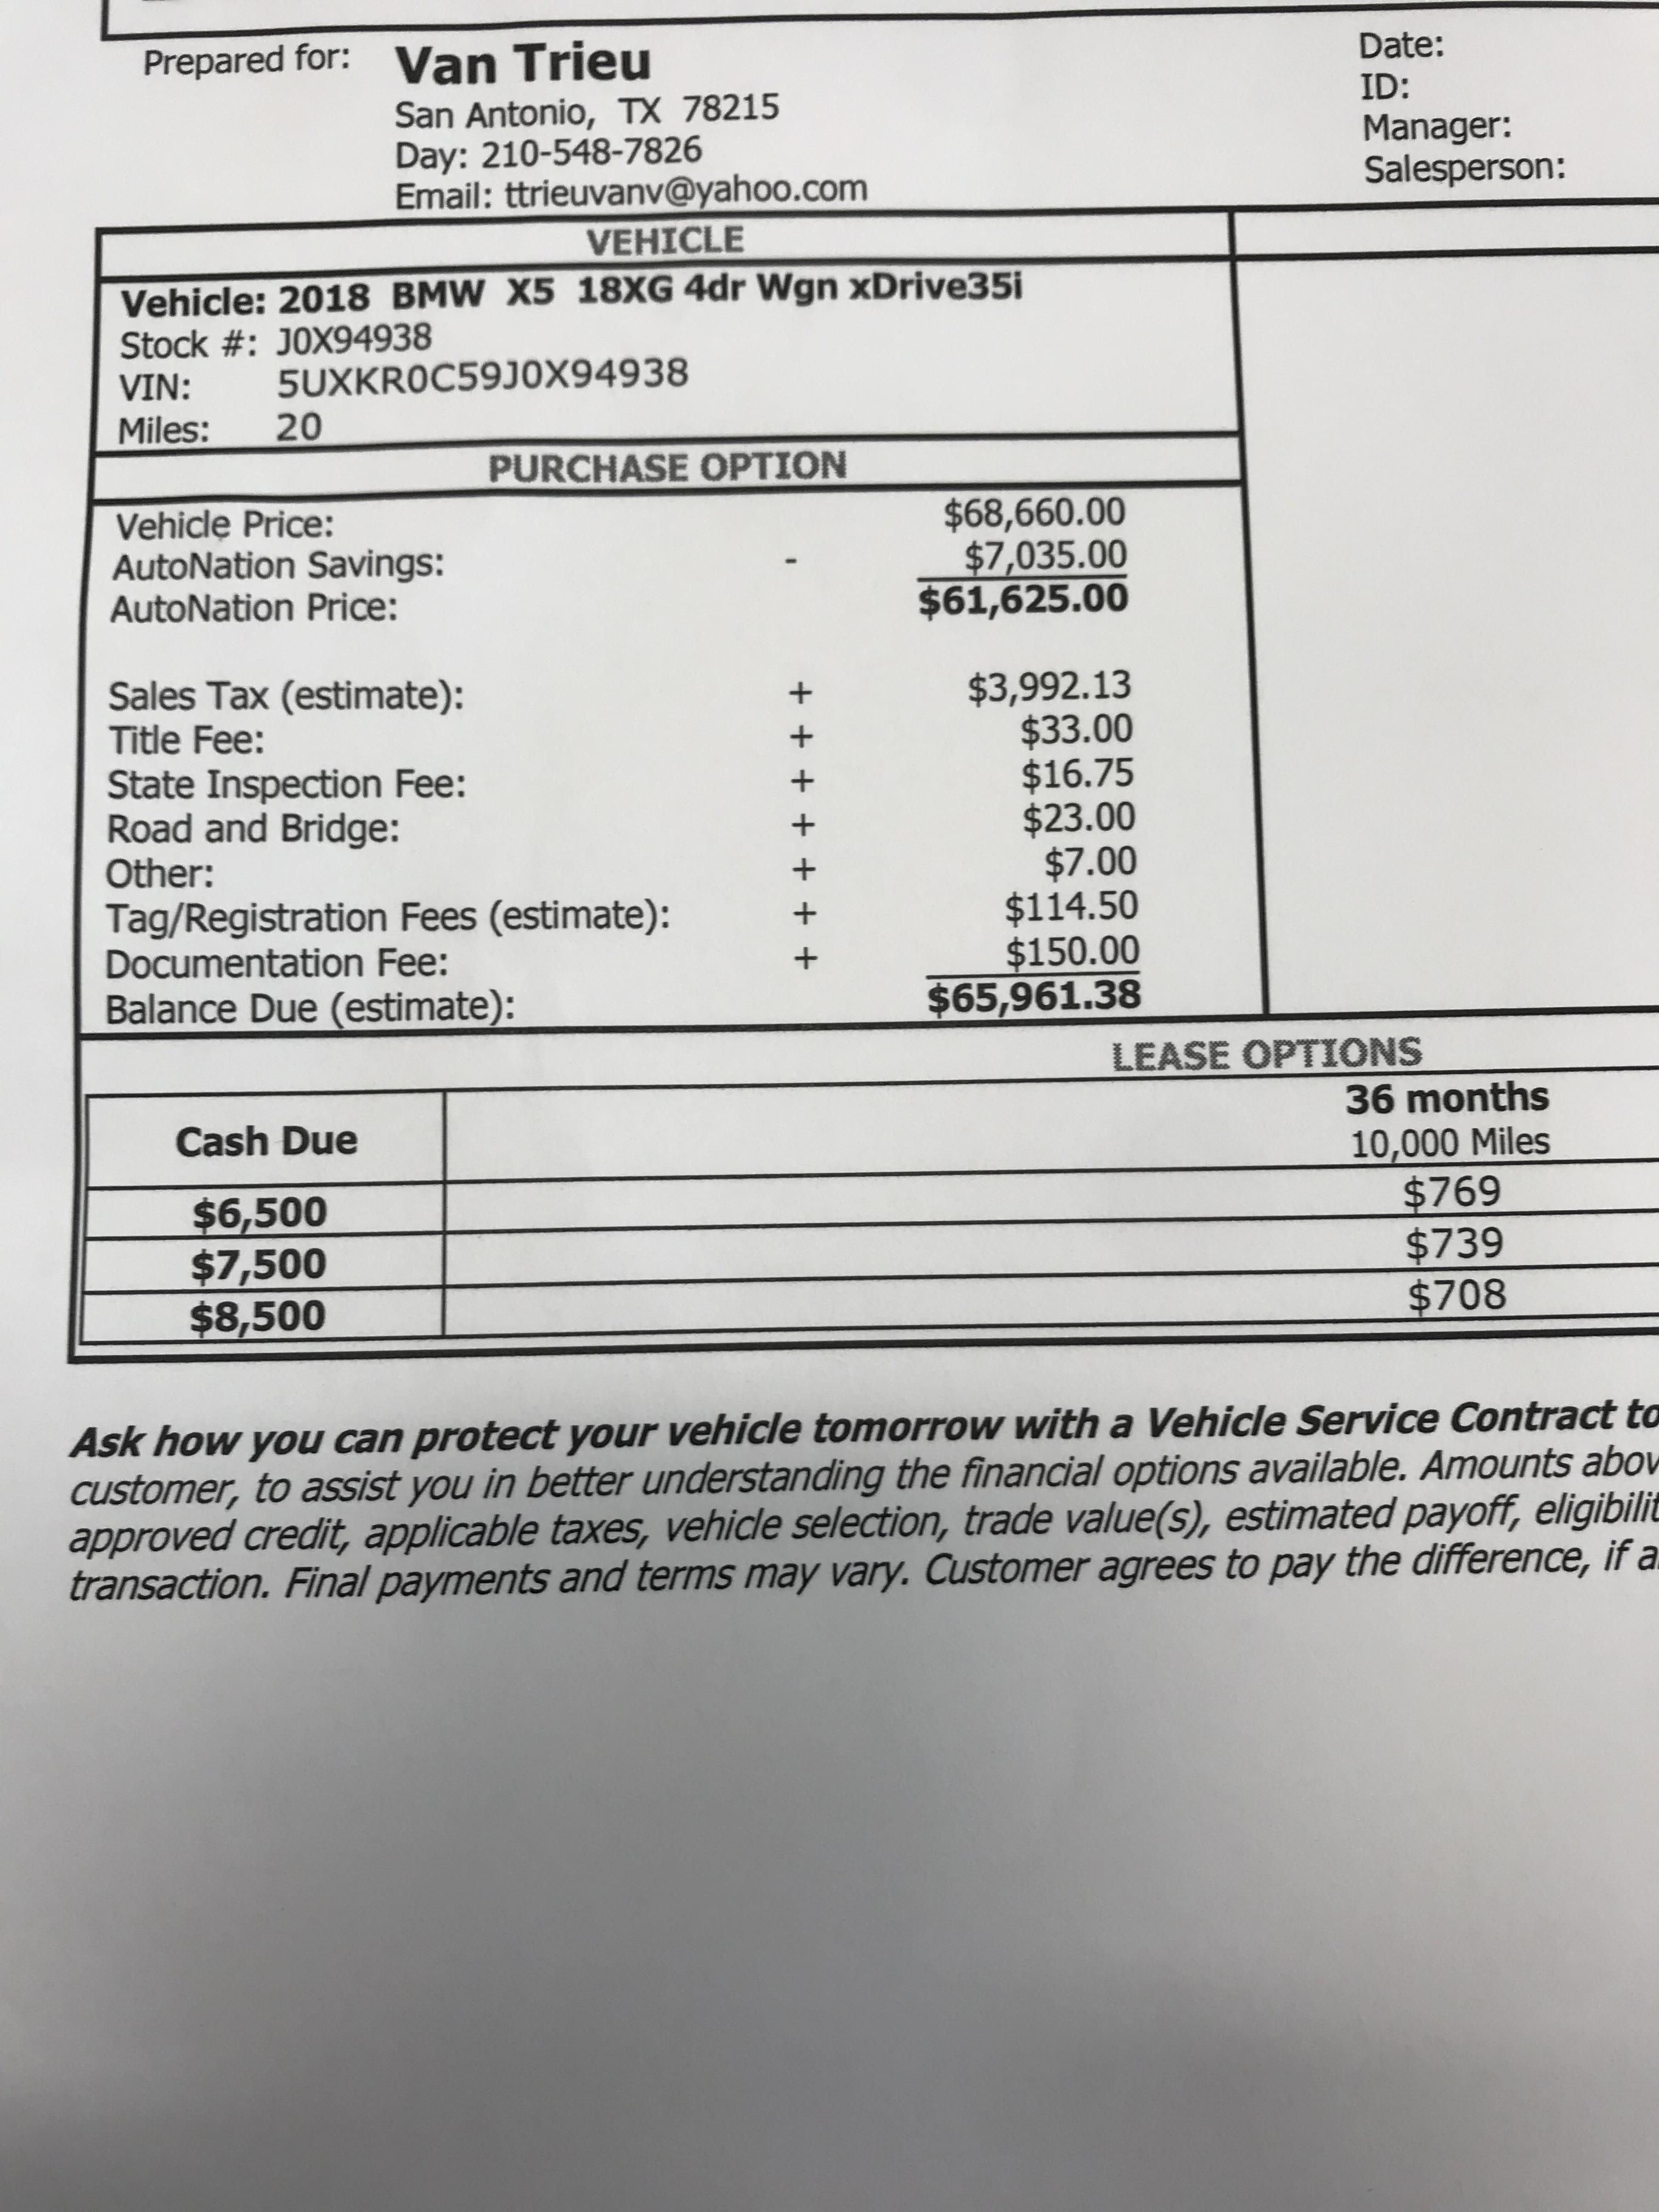 Estimate Lease Payment >> 2018 Bmw X5 Lease Deals And Prices Page 16 Car Forums At Edmunds Com